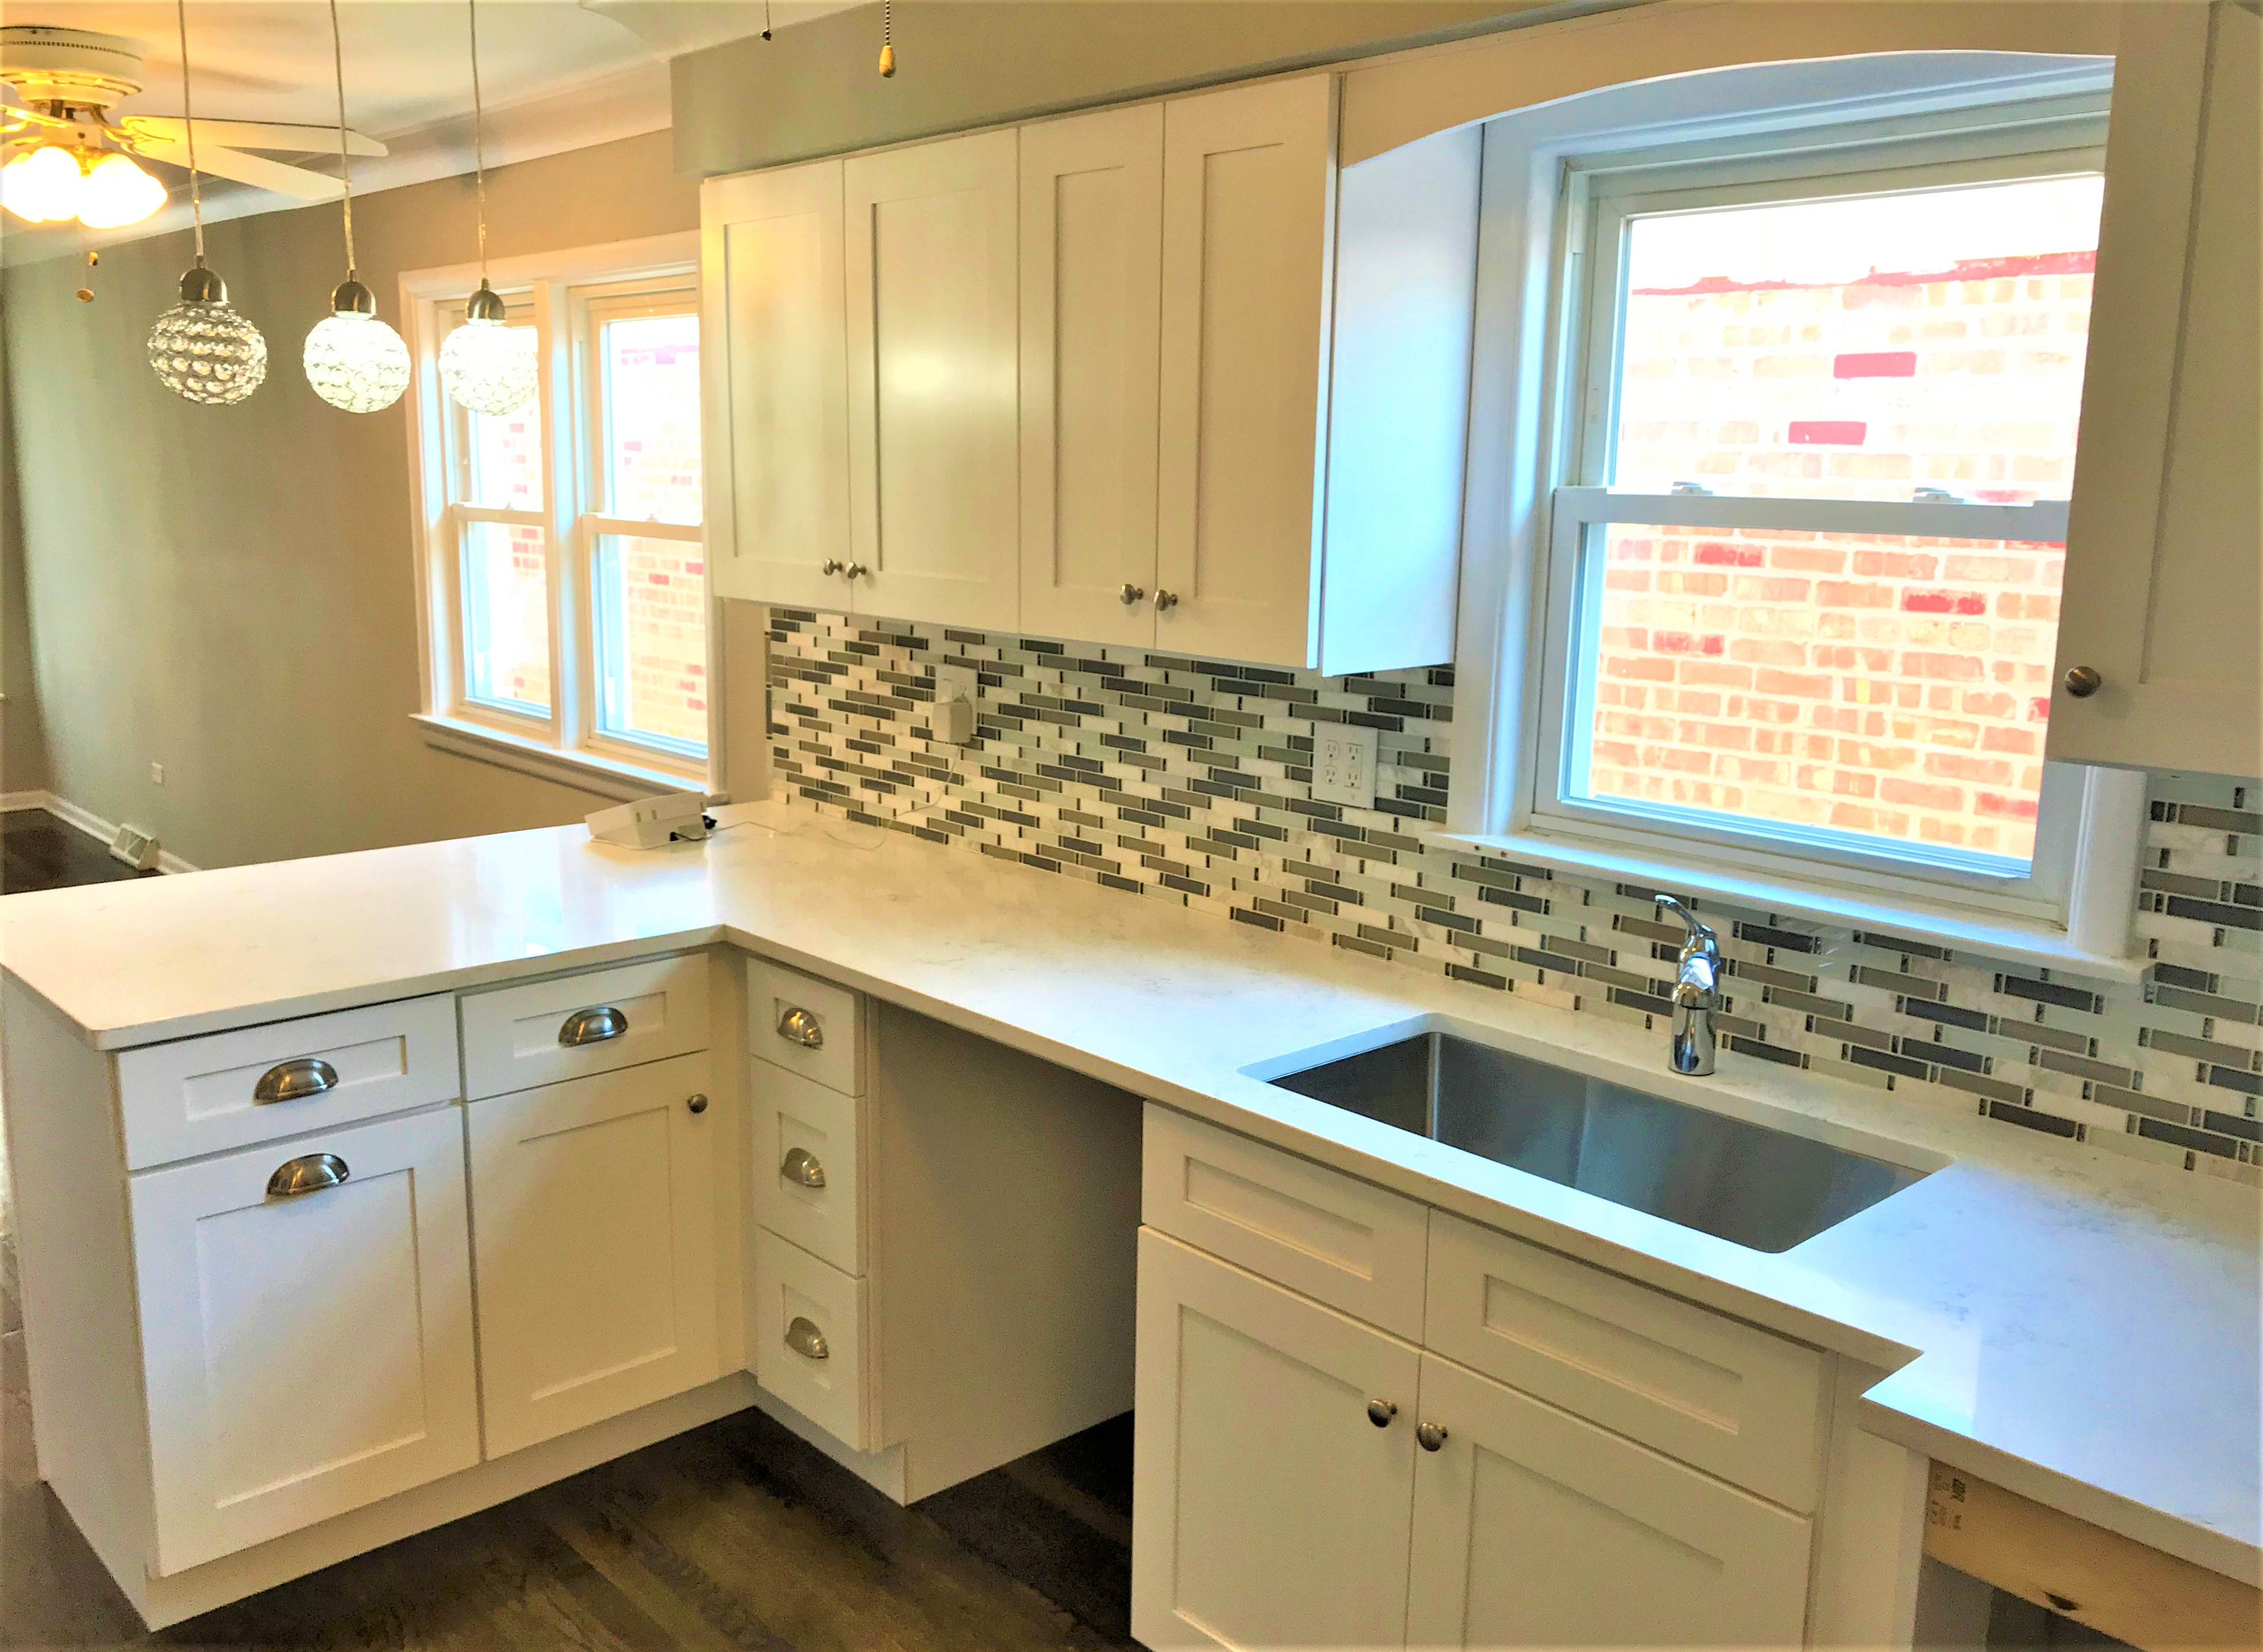 Guide to Quartz, Granite and Laminate Countertops